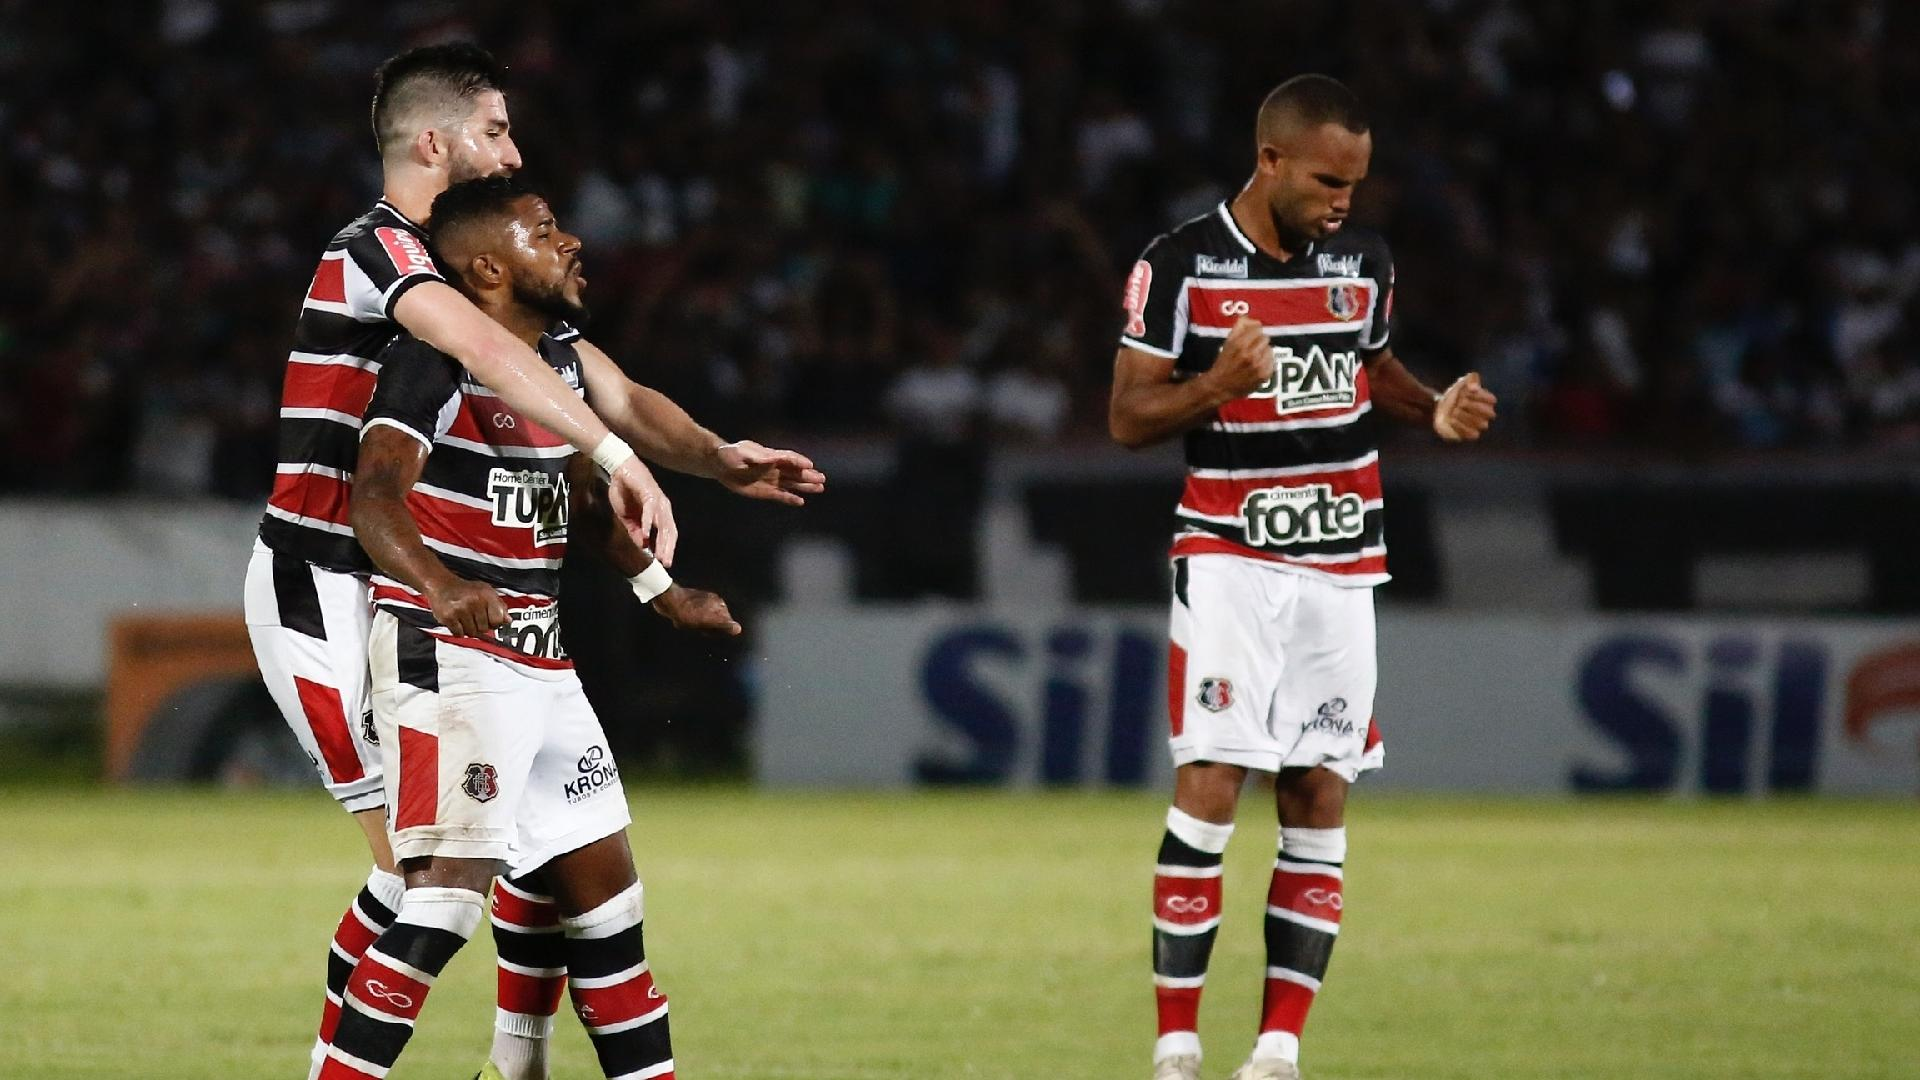 Jogadores do Santa Cruz comemoram gol contra o Fluminense